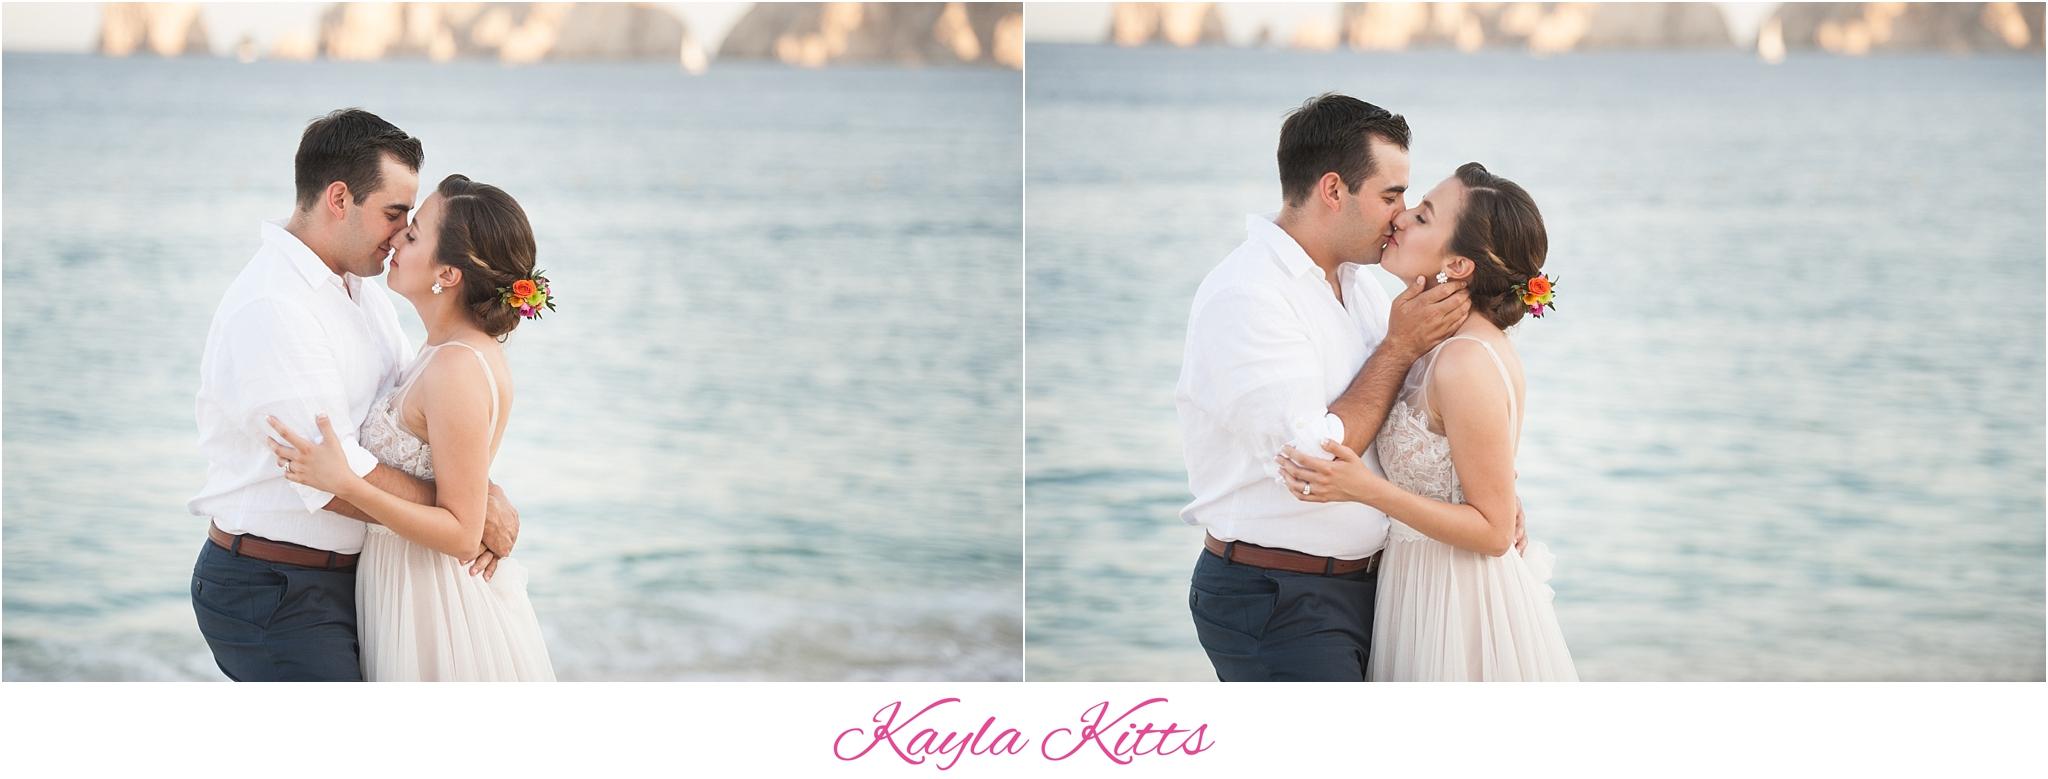 kayla kitts photography-travis and sarah-cabo wedding-cabo wedding photographer-destination wedding photographer-paris wedding photographer-albuquerque wedding-matt jones-albuquerque wedding vendor-intimate wedding_0029.jpg